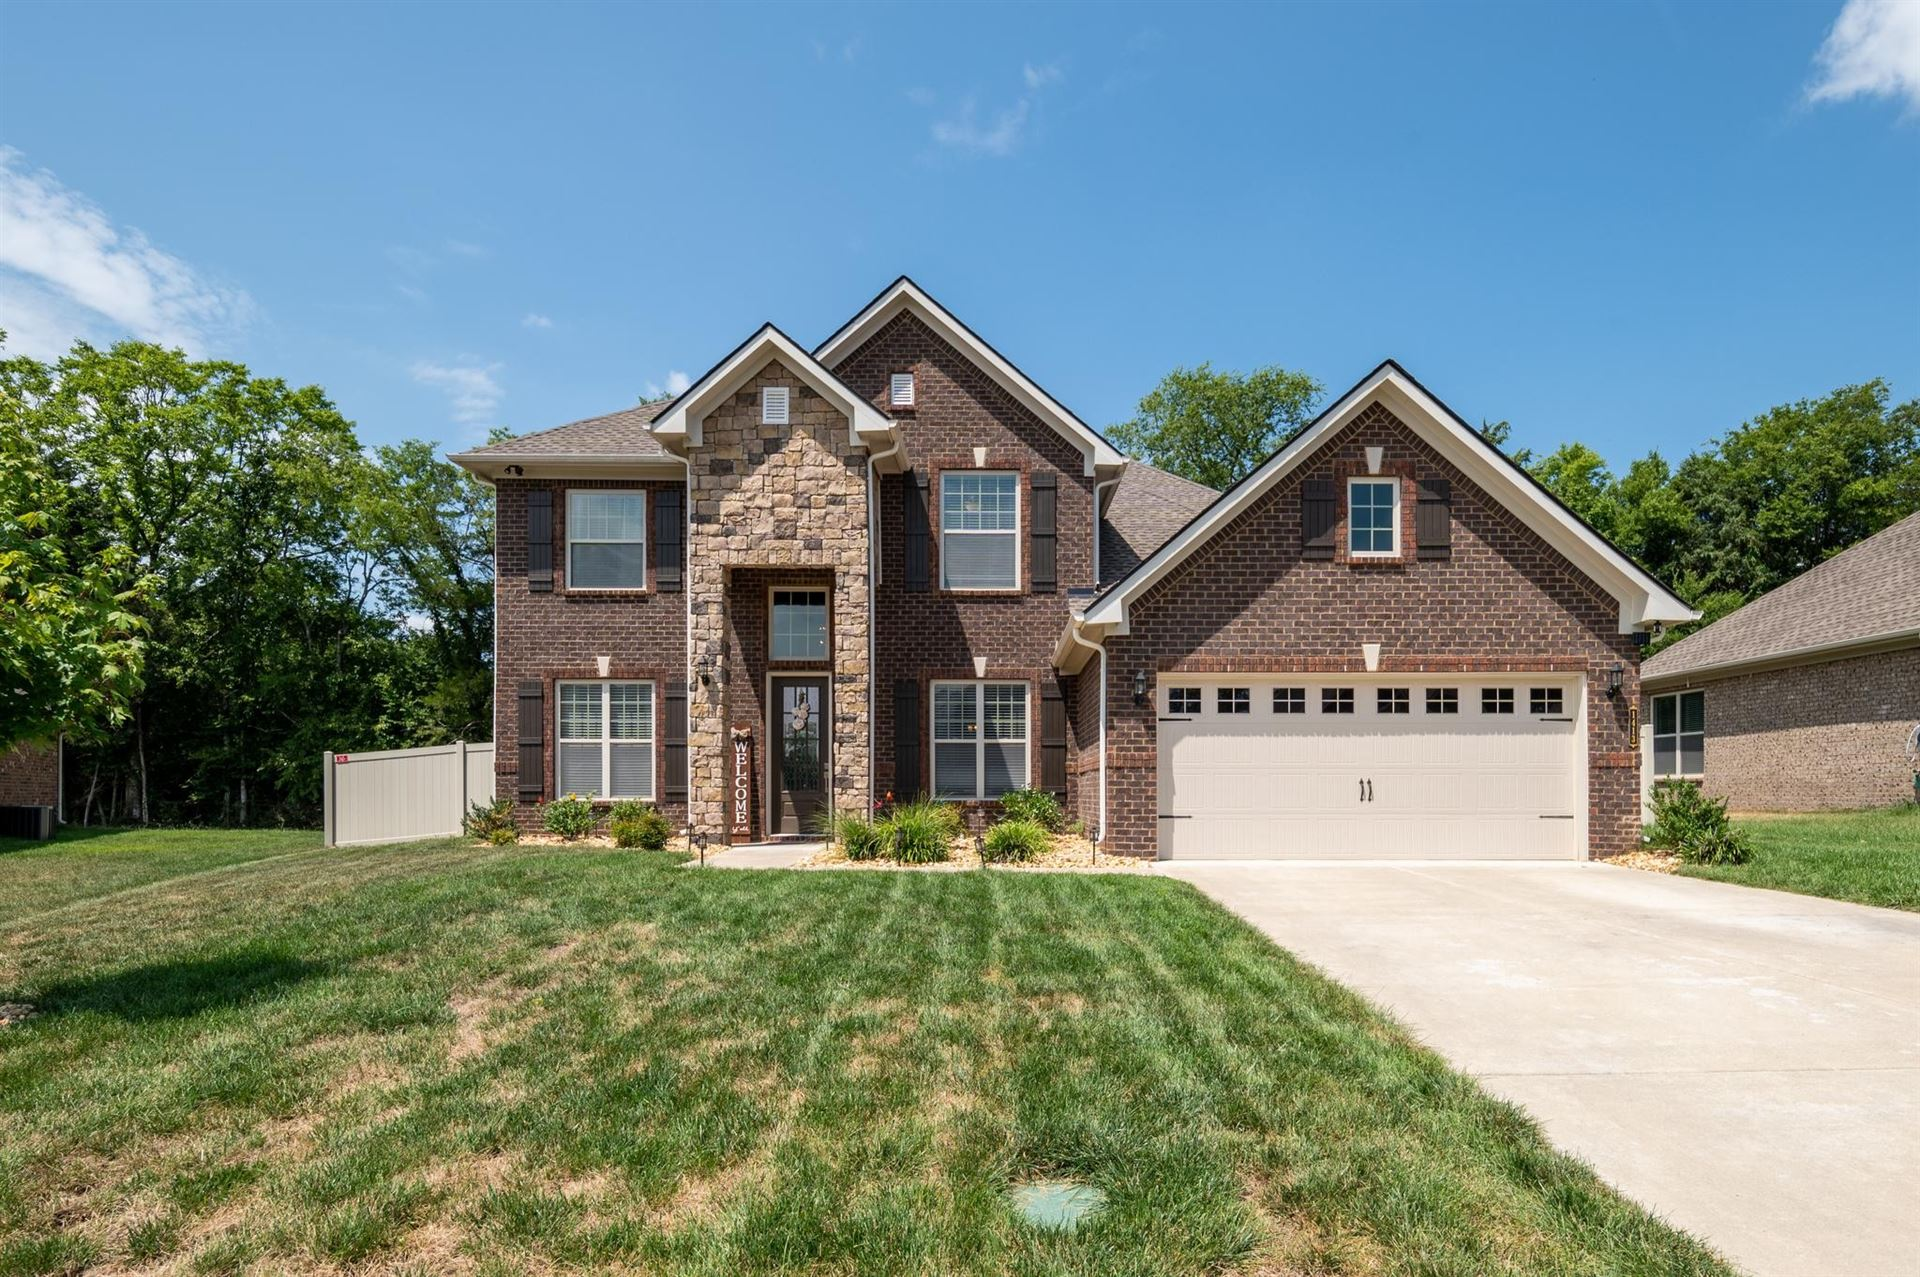 1413 Burrows Ave, Murfreesboro, TN 37129 - MLS#: 2282969